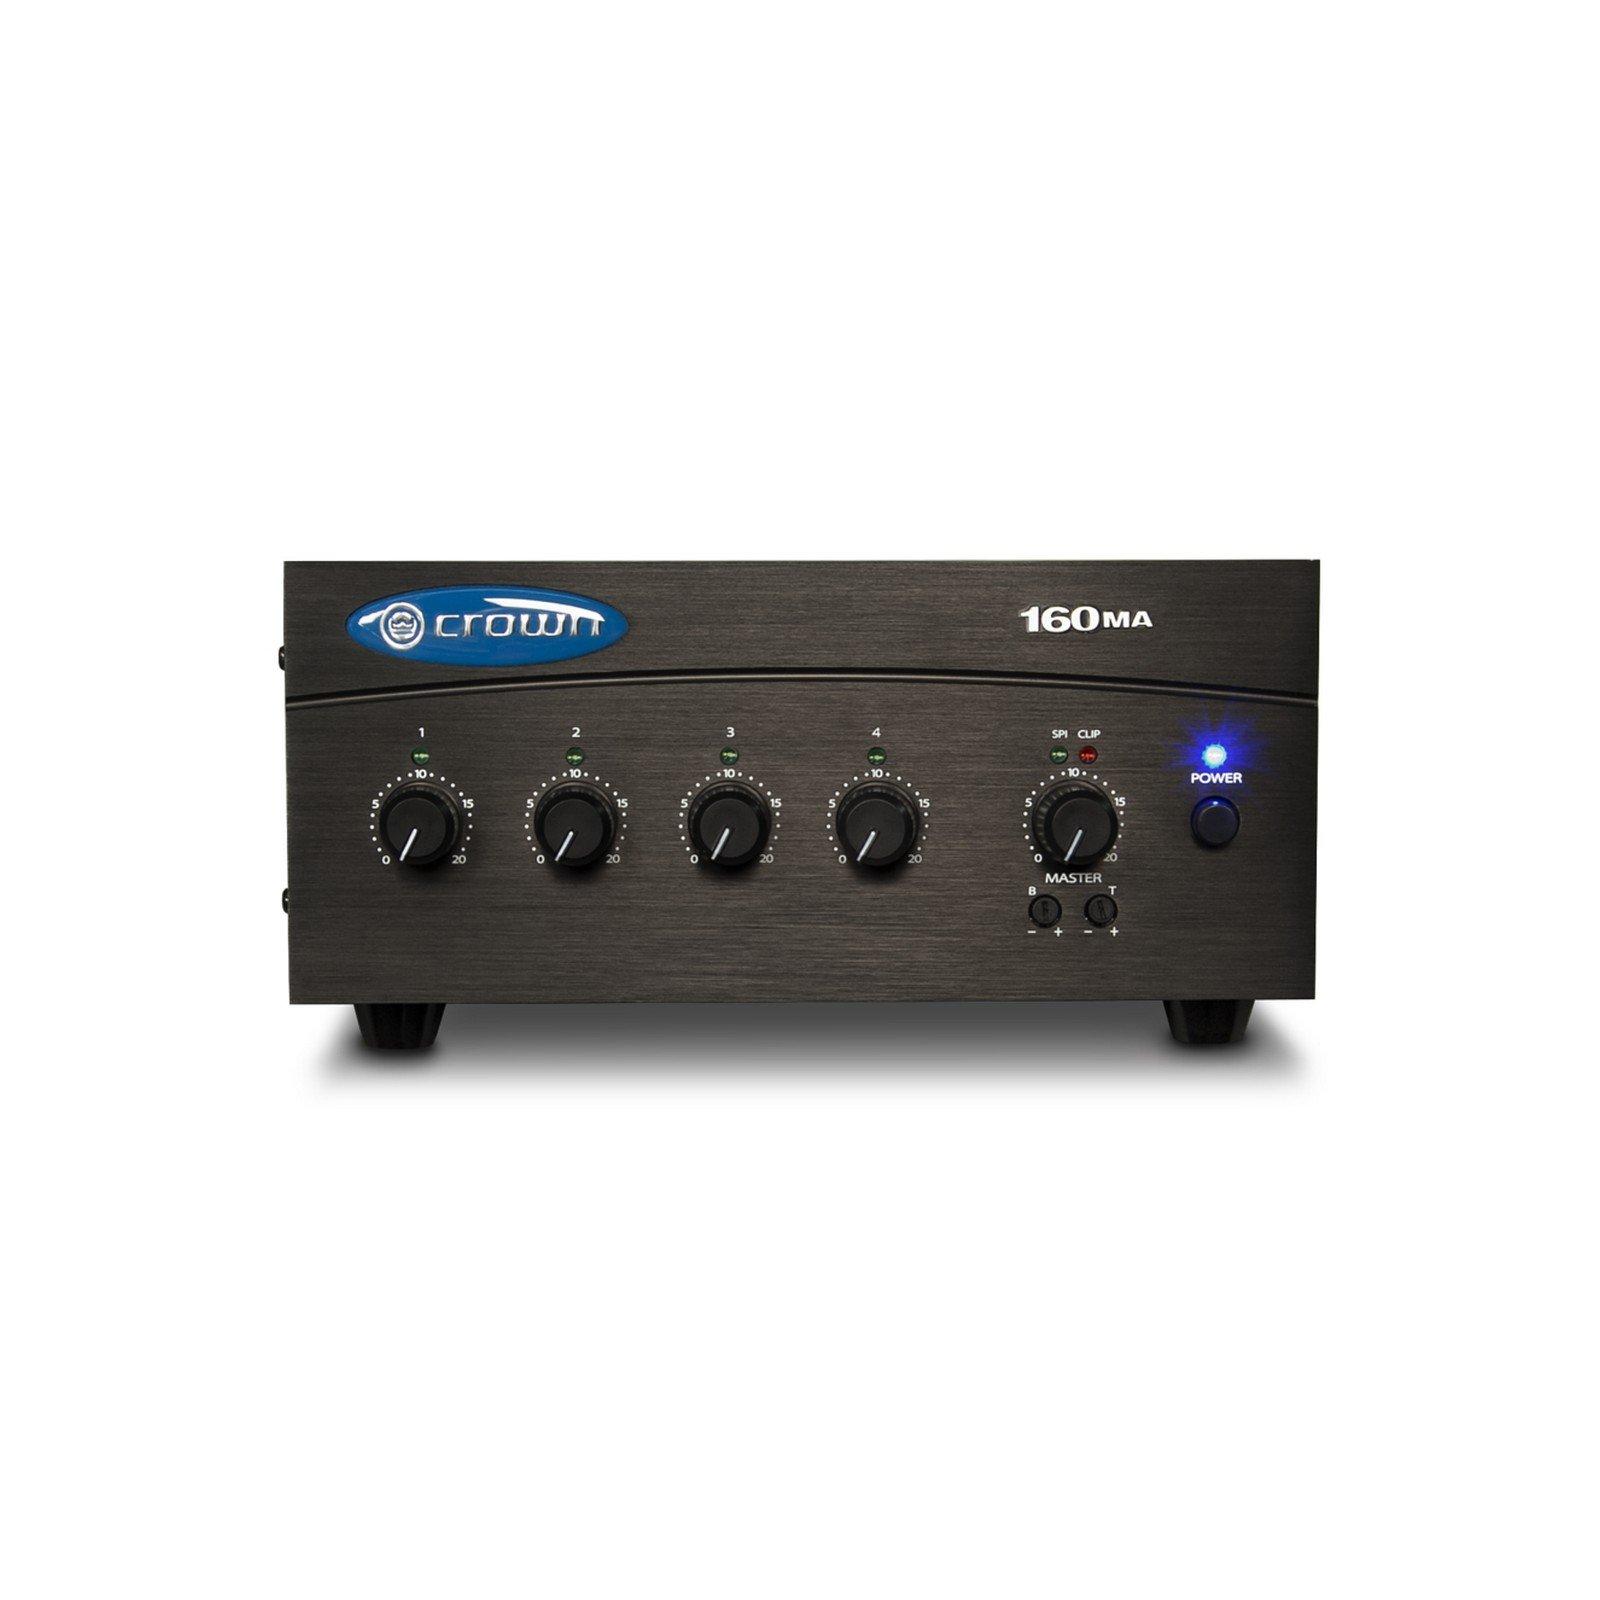 Crown 160MA   4 Input 60 Watt Commercial Audio Vox Muting Dual Stereo RCA Phoenix Inputs Powered Mixer Amp